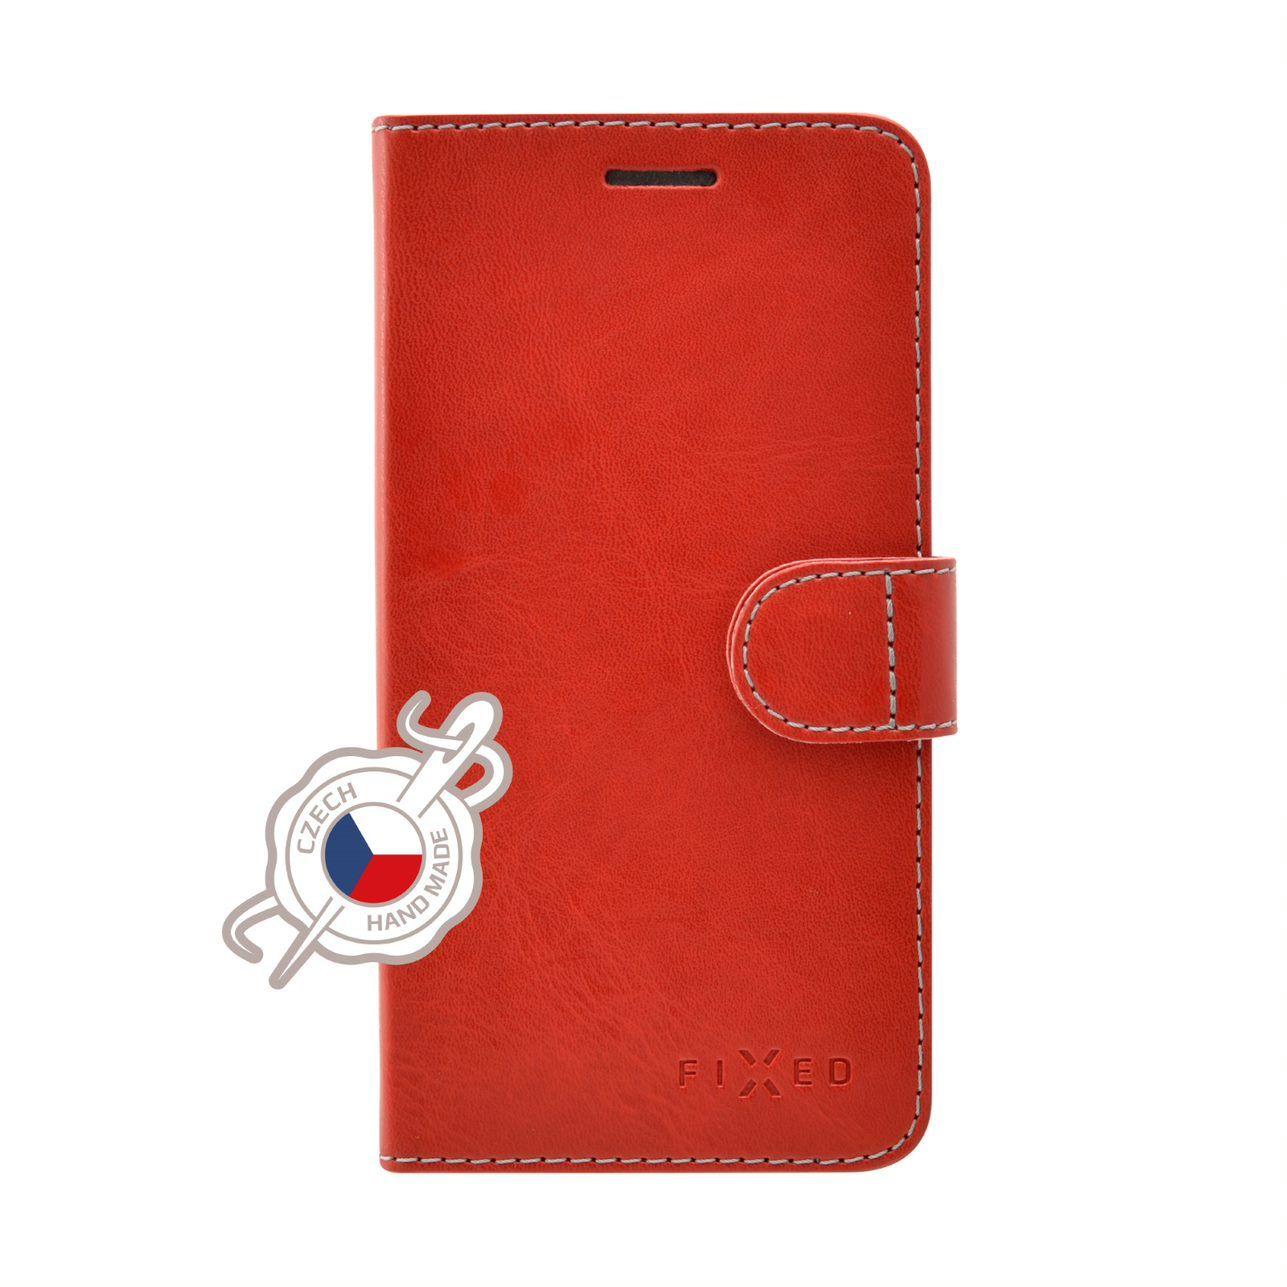 Pouzdro typu kniha FIXED FIT pro Apple iPhone 6/6S, červené